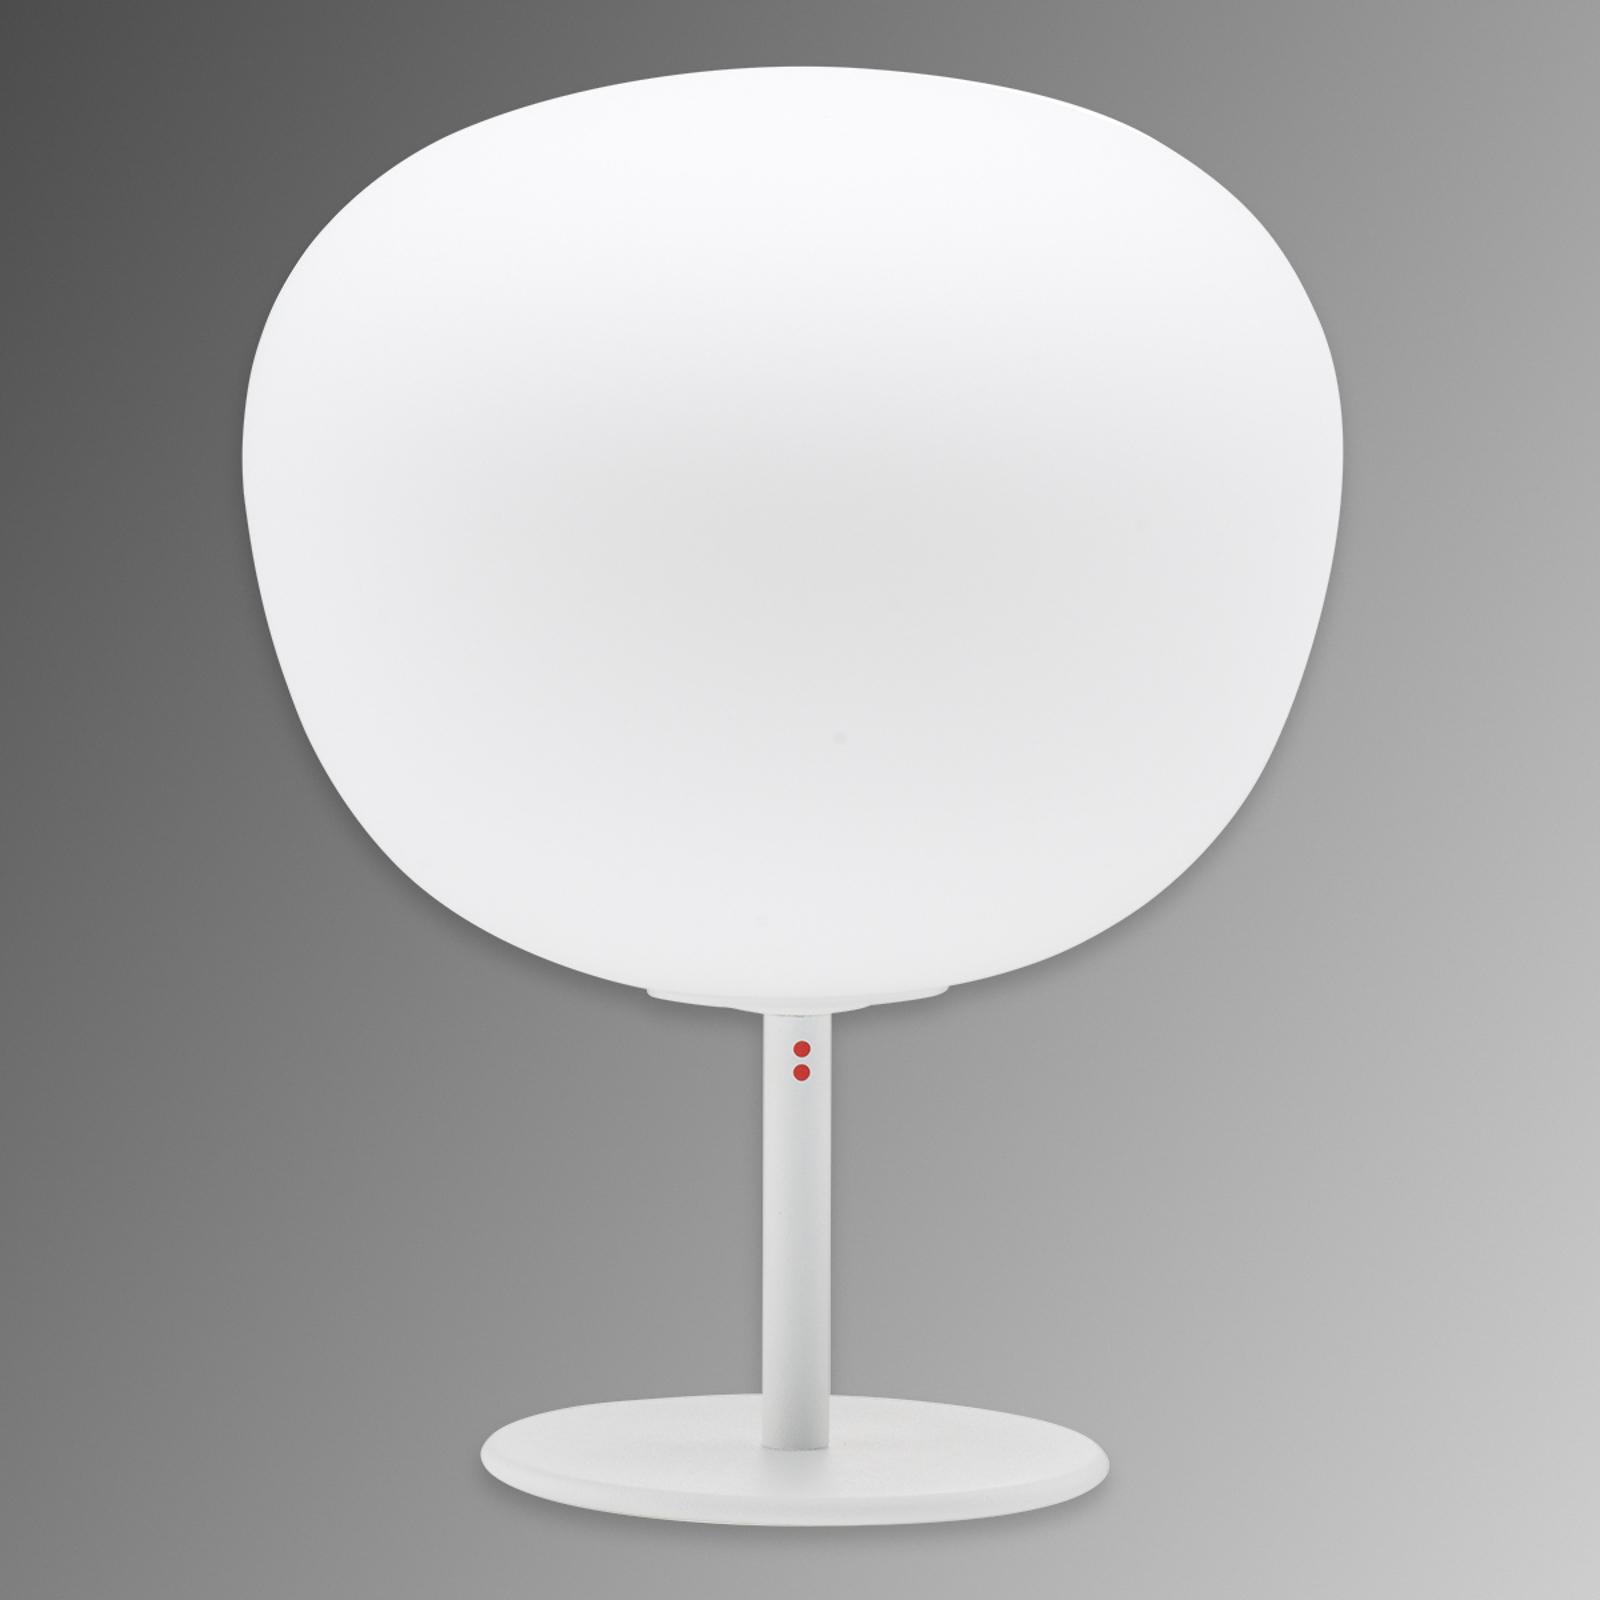 Fabbian Lumi Mochi table lamp, standing, Ø 20cm_3503147_1